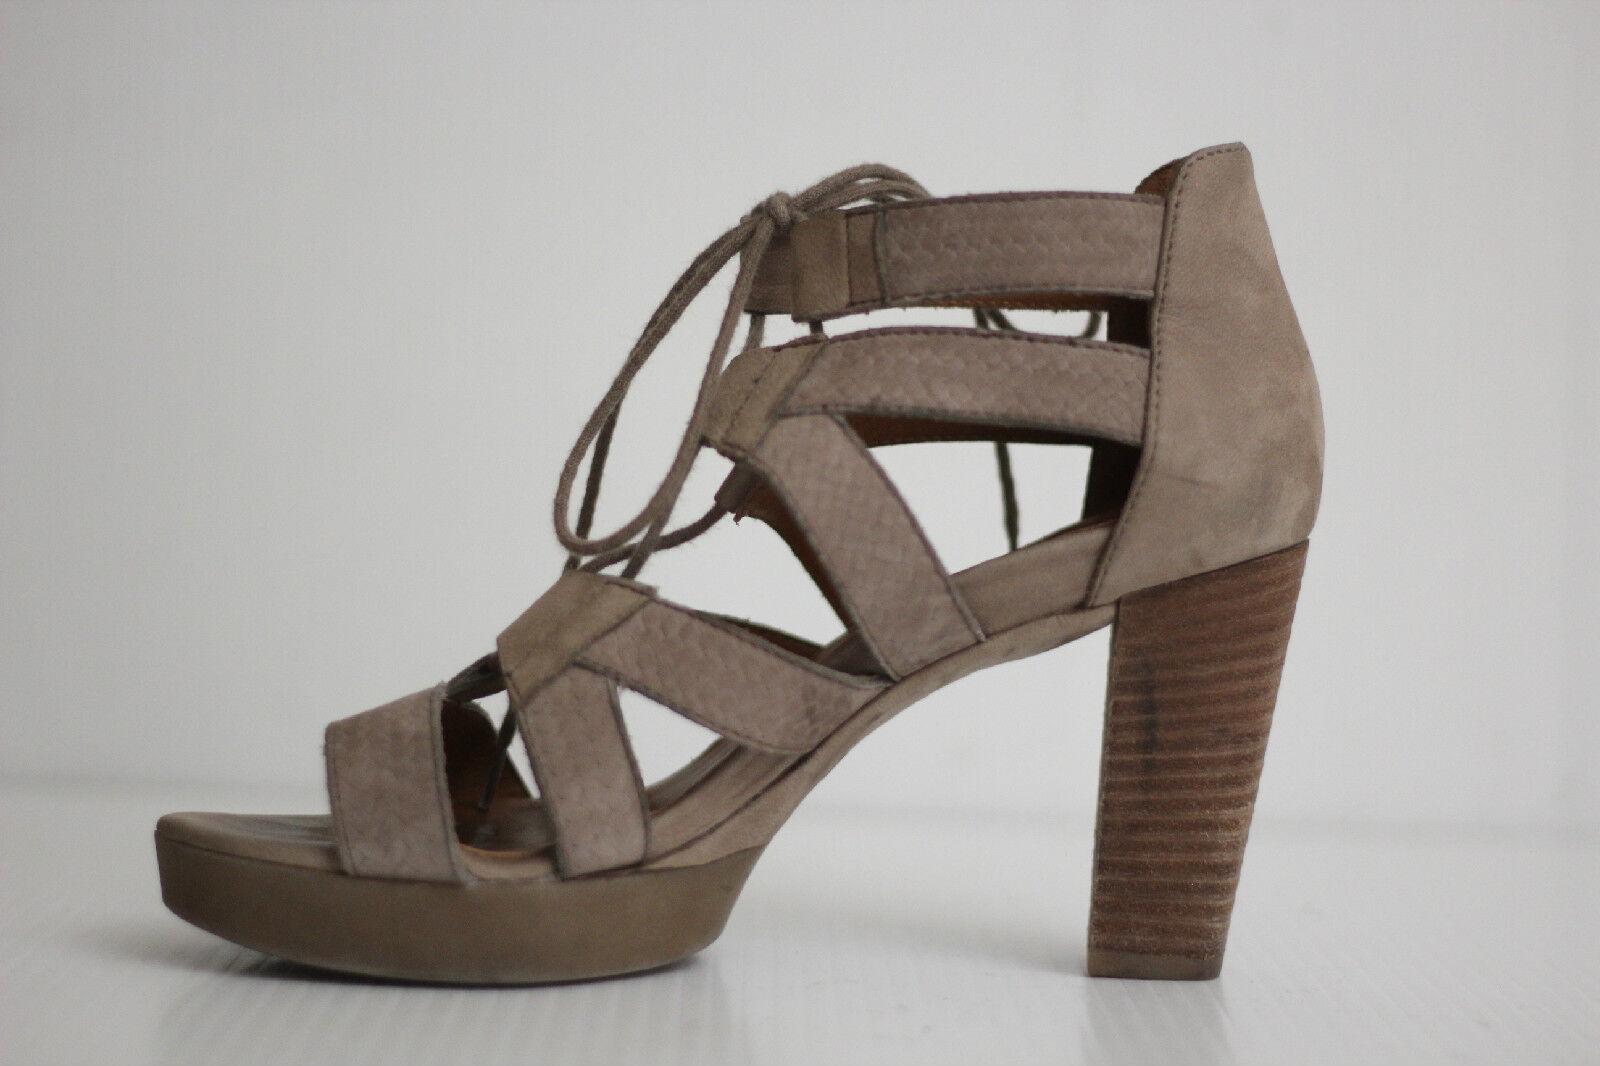 339 Paul Green Hana Lace-Up Sandal - Earth Grey Size - Size Grey 6.5 US / 4 UK (X92) daefe6